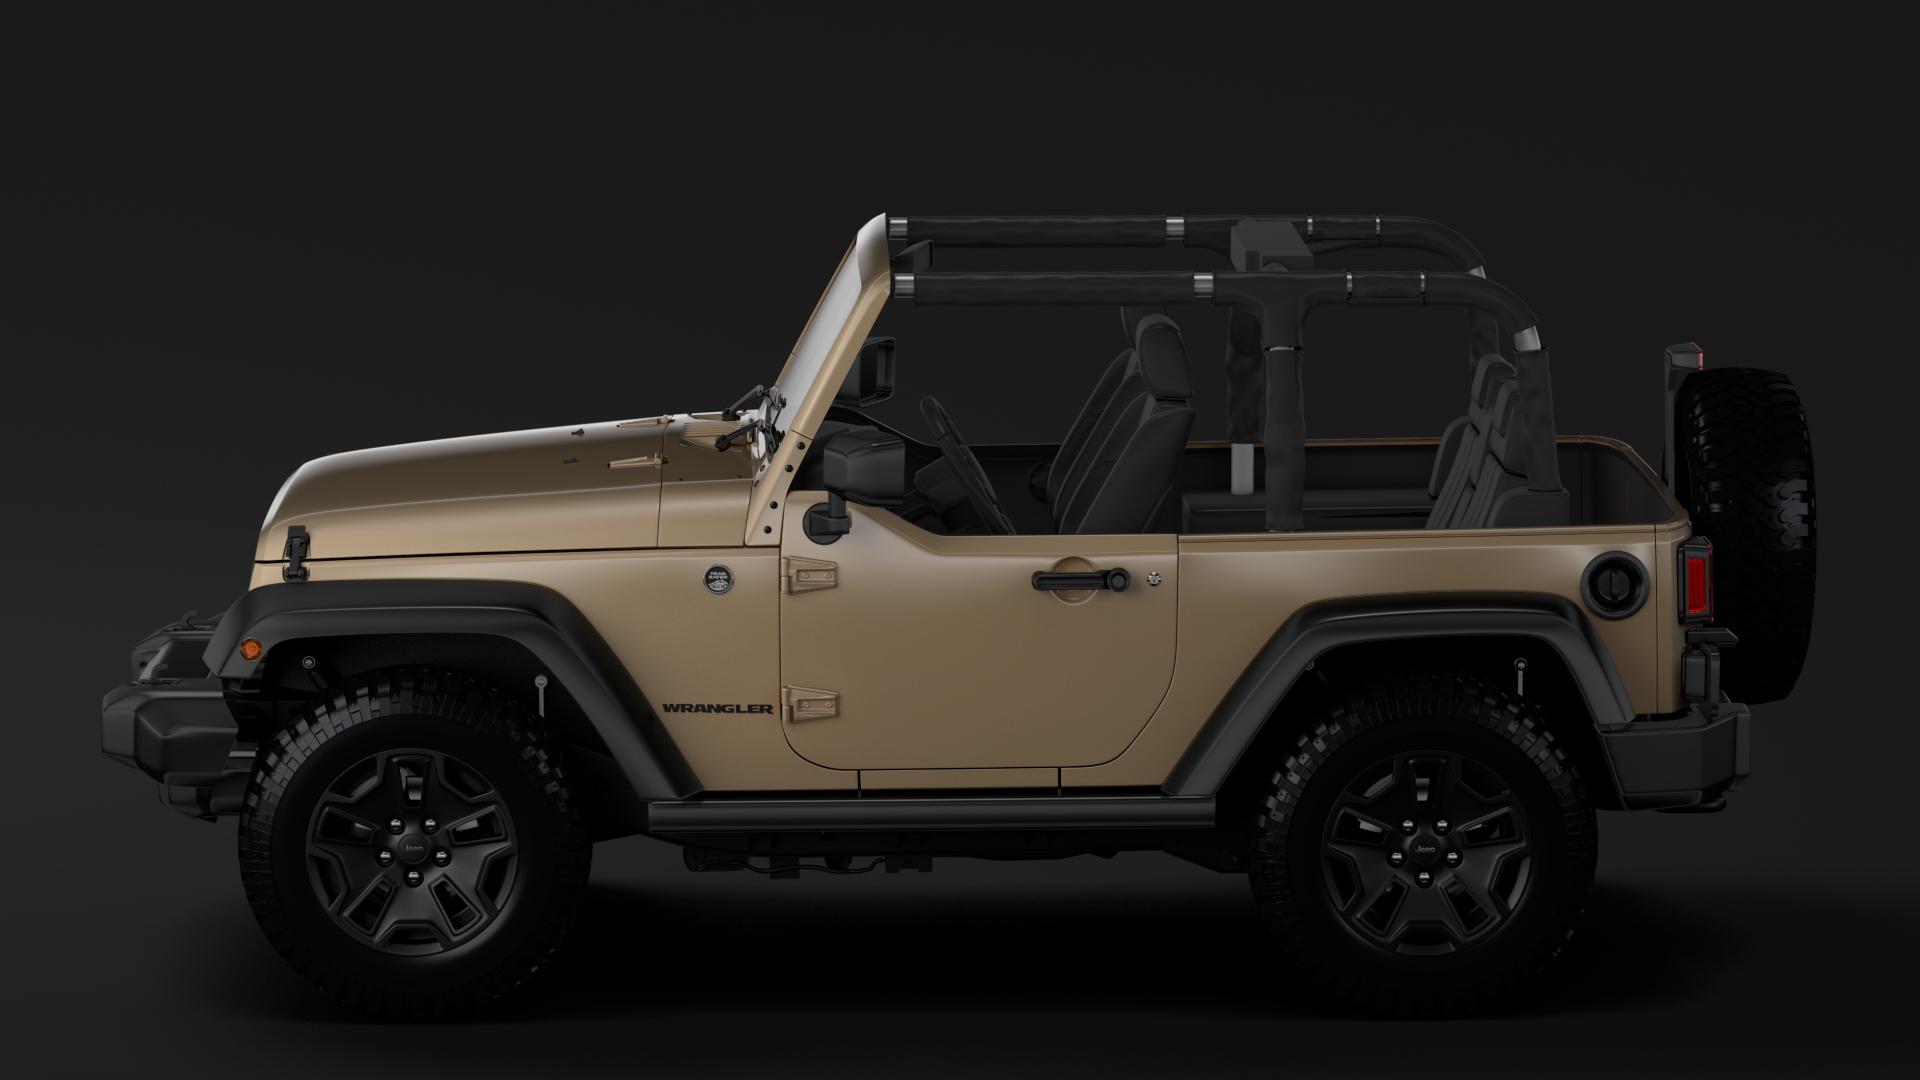 jeep wrangler willys wheeler jk 2017 3d model max fbx c4d lwo ma mb hrc xsi obj 276802